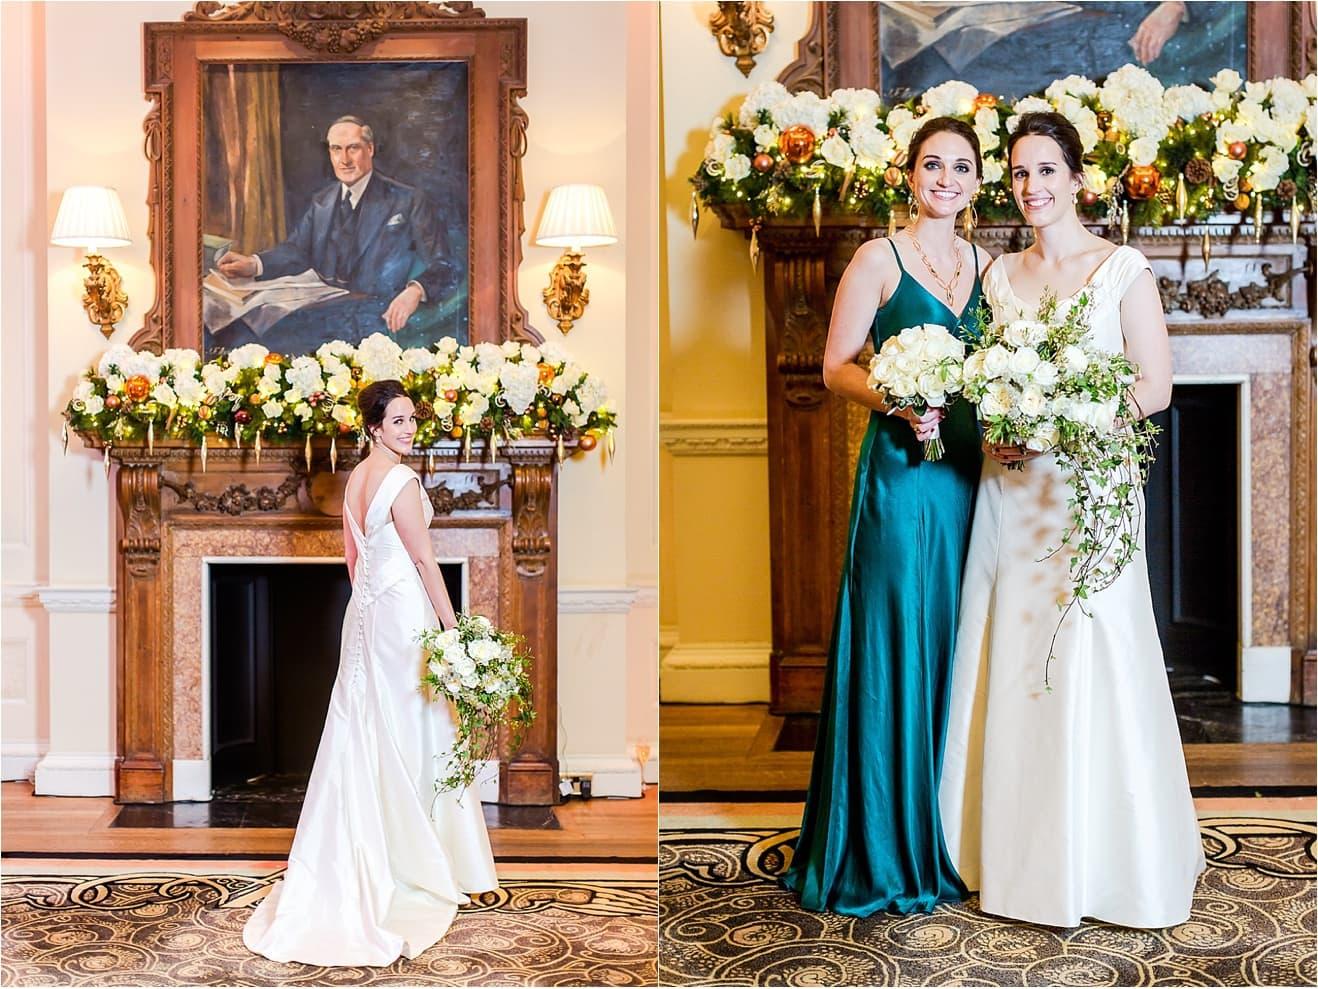 32-hedsor-winter-wedding-eddie-judd-photography